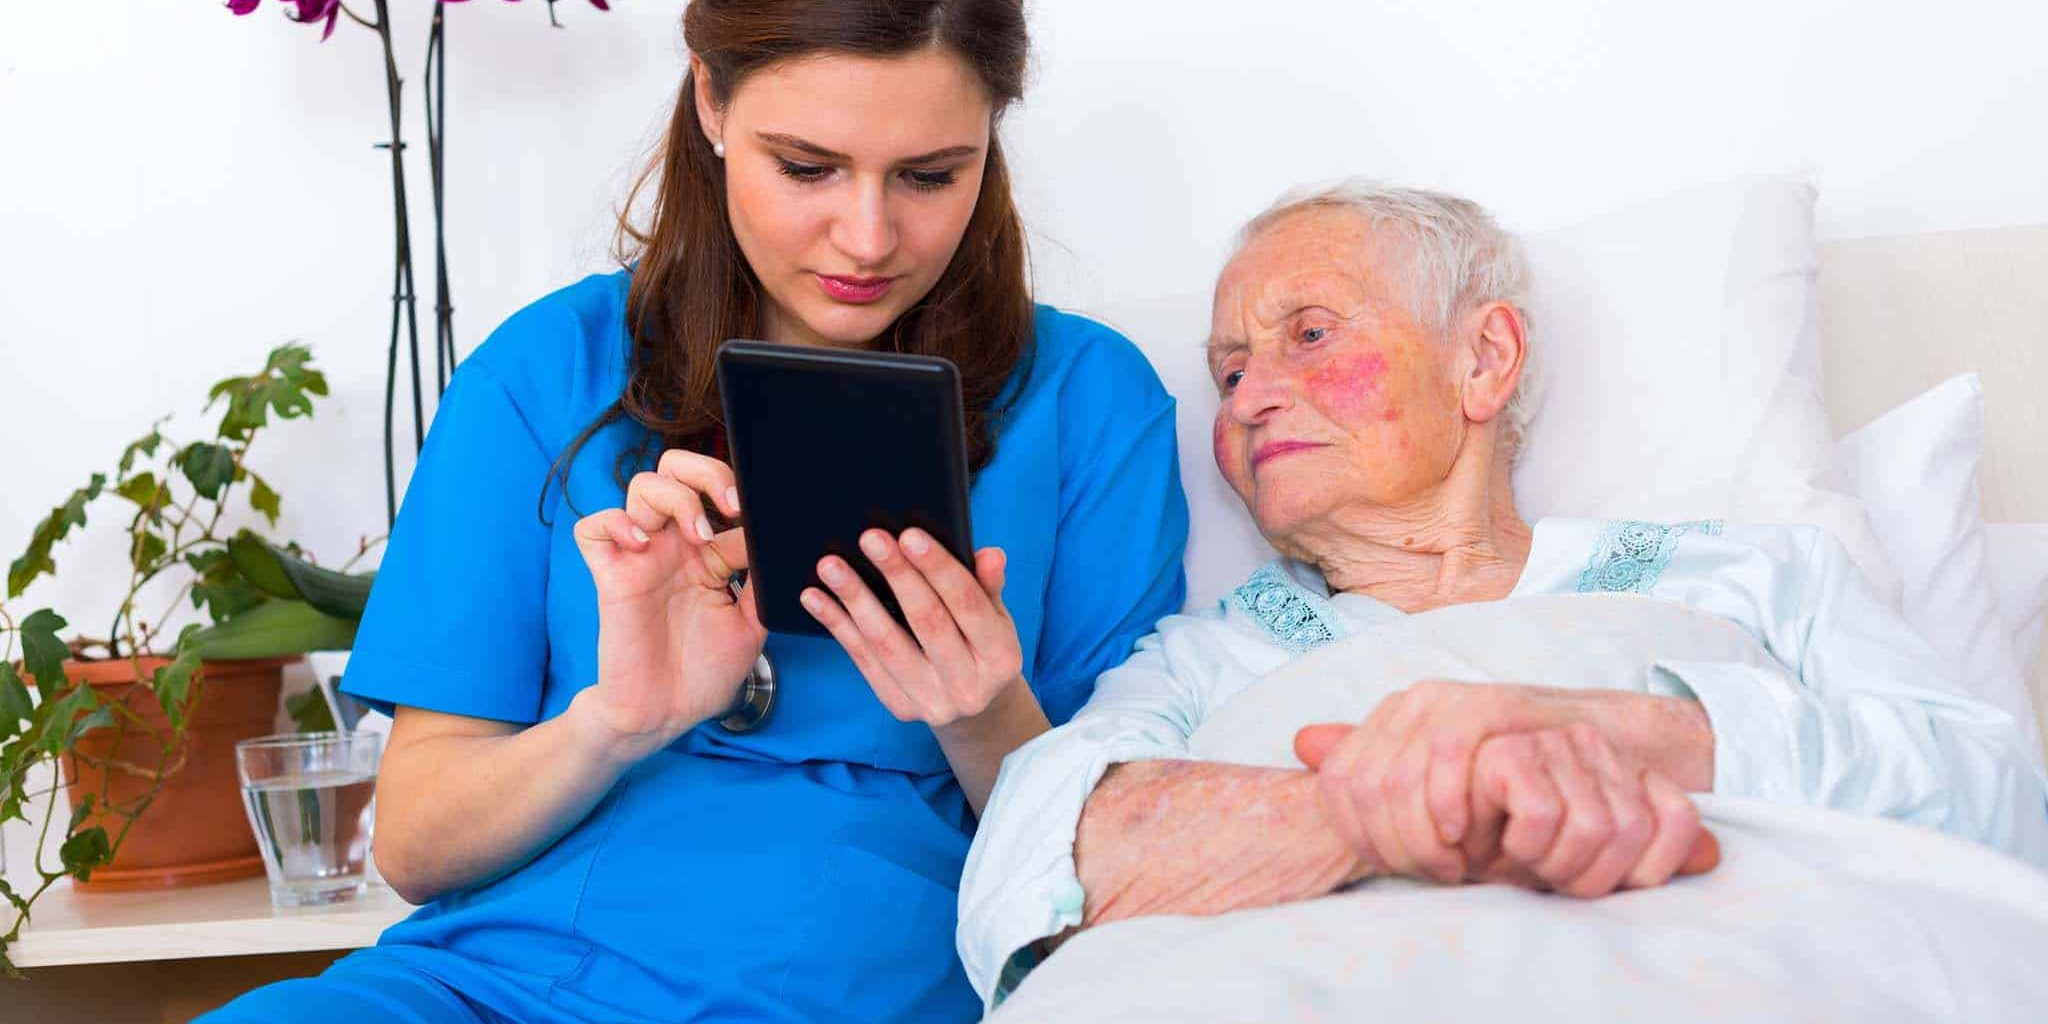 LTC home health hospice nursing and executive job recruiter